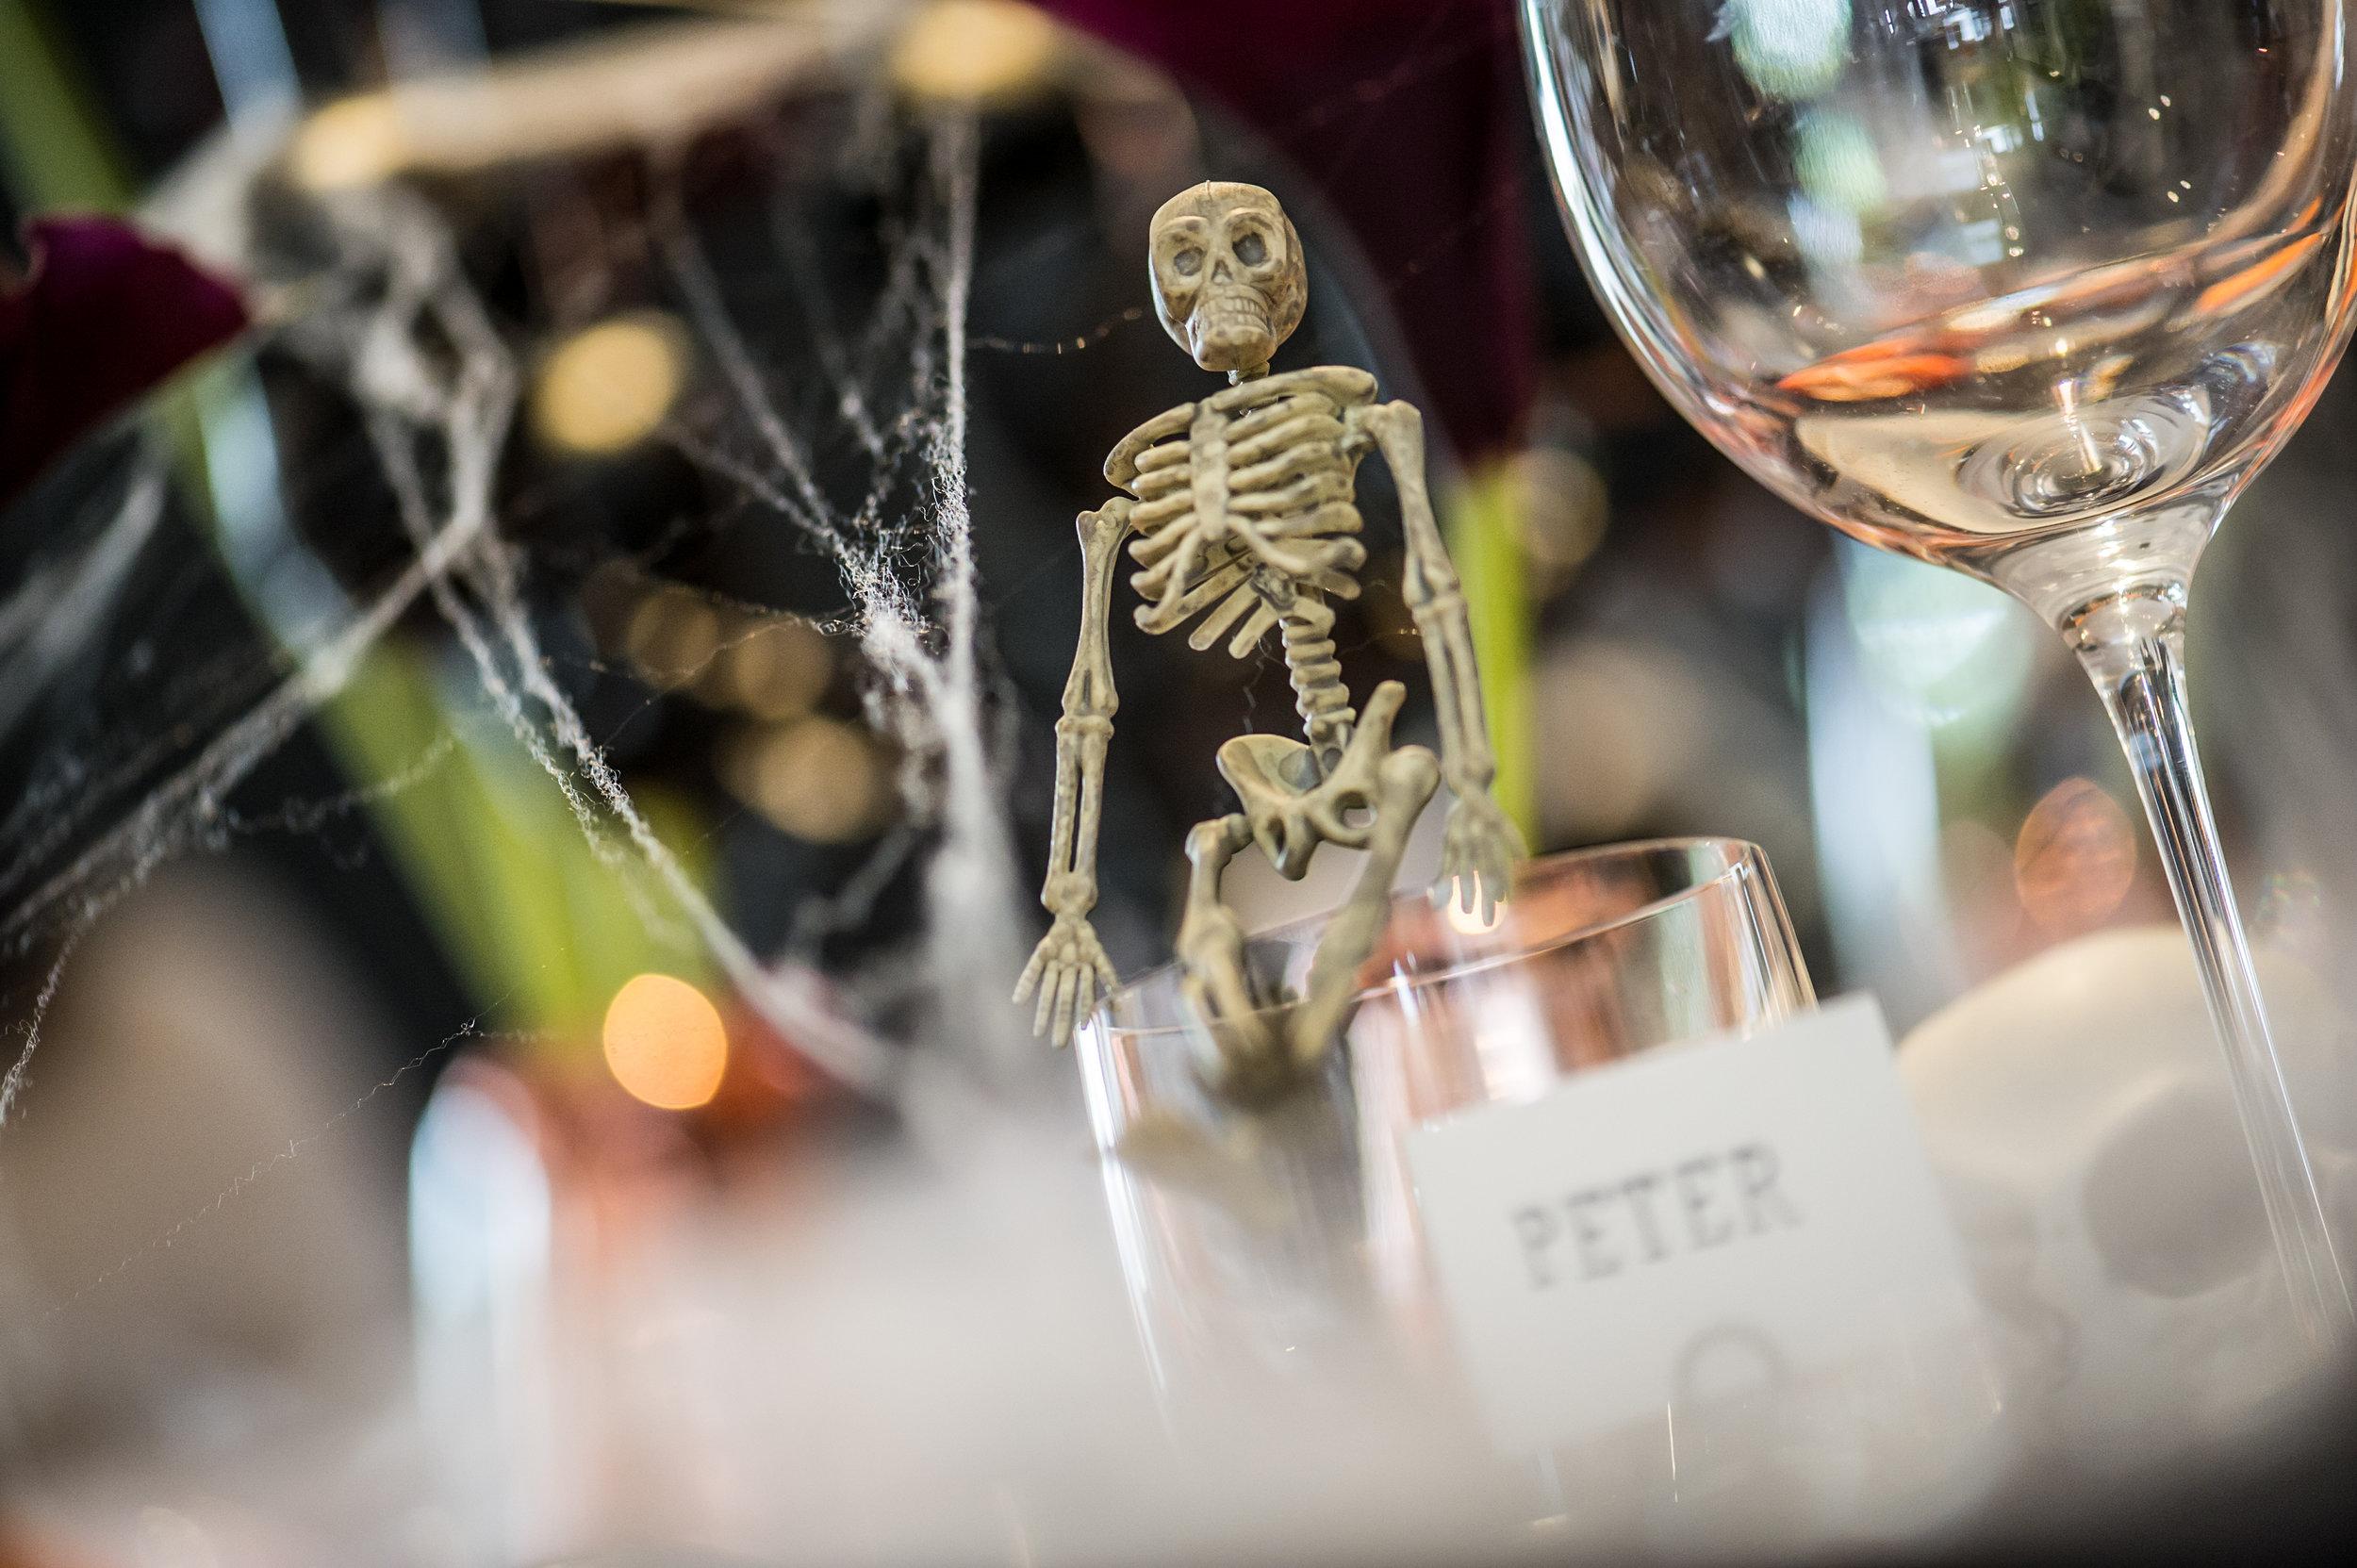 Halloween Party Decoration Ideas and Halloween Table Setting Inspiration - Mini Skeleton Decorations.jpg